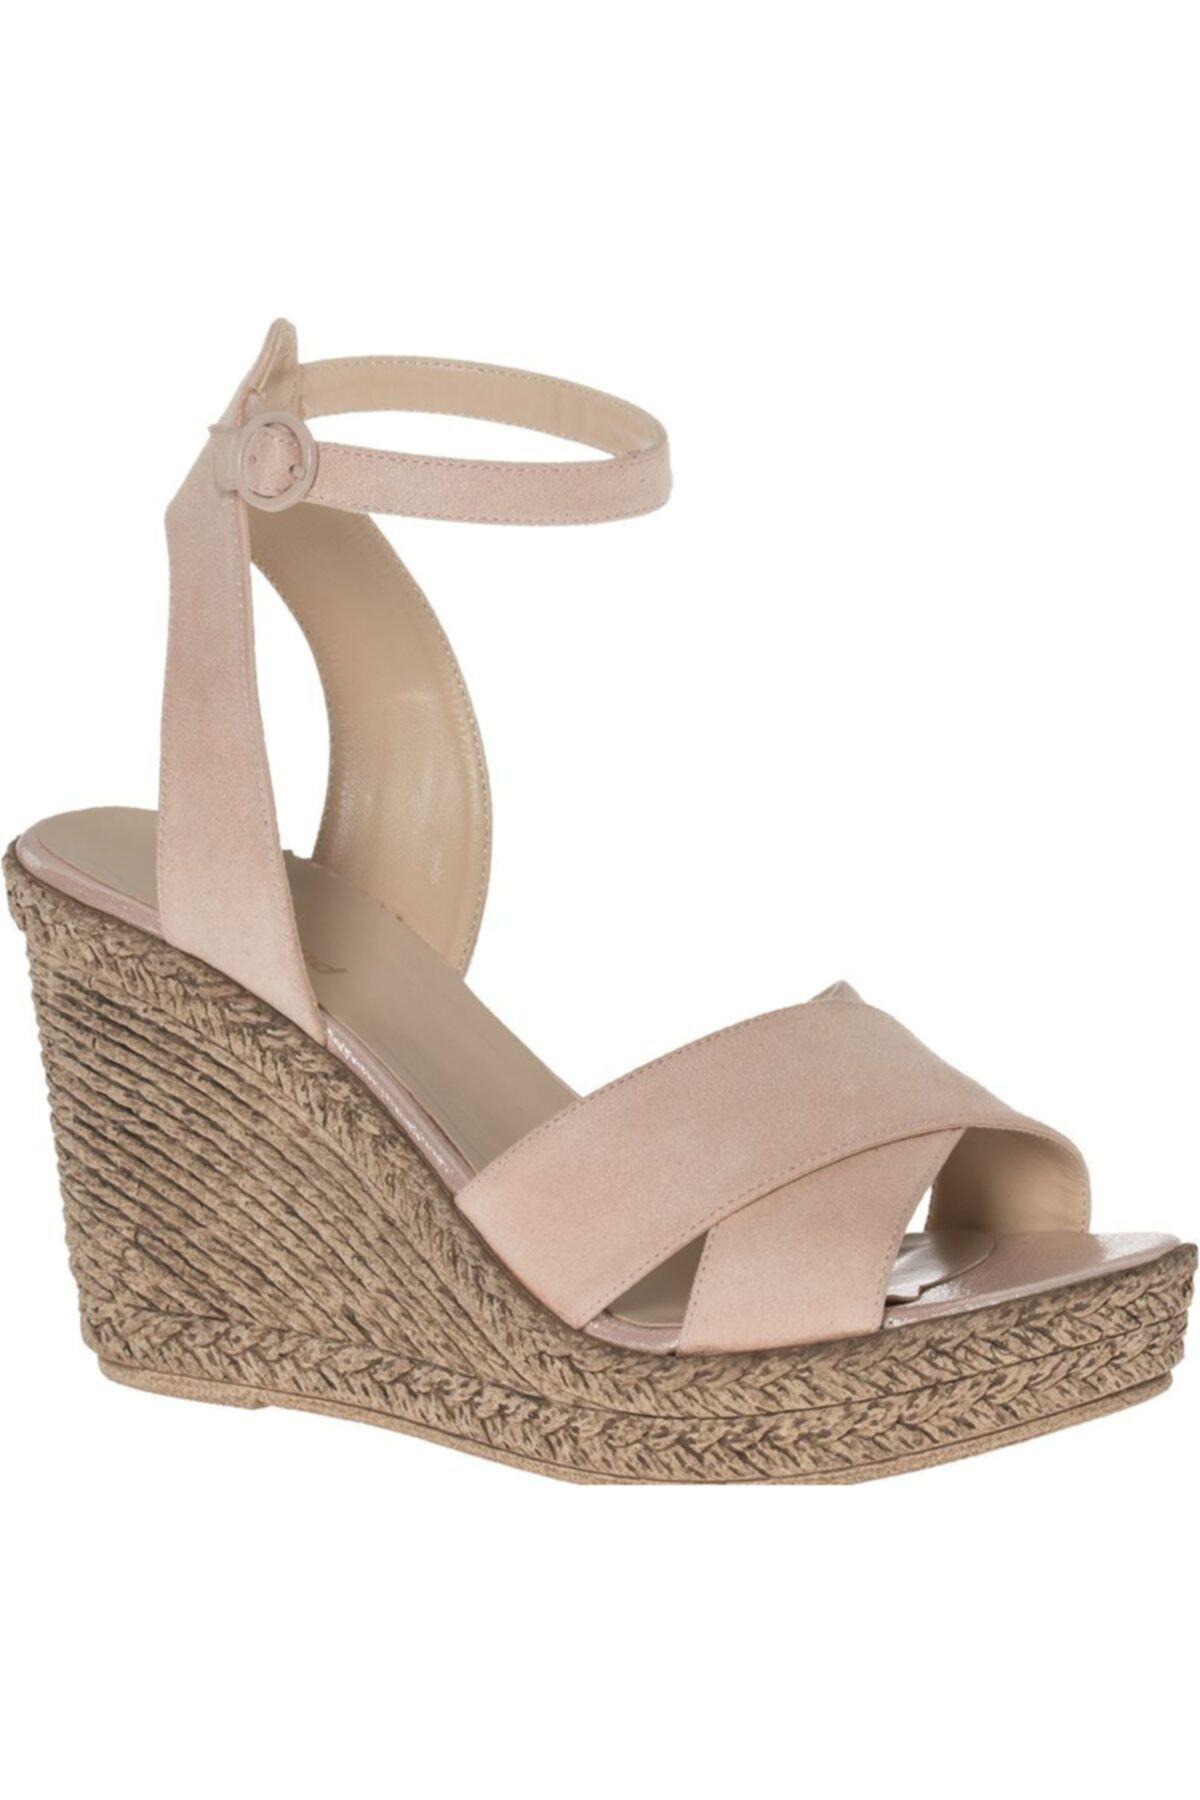 Graceland Deichmann Graceland Kadın Pudra Topuklu Sandalet